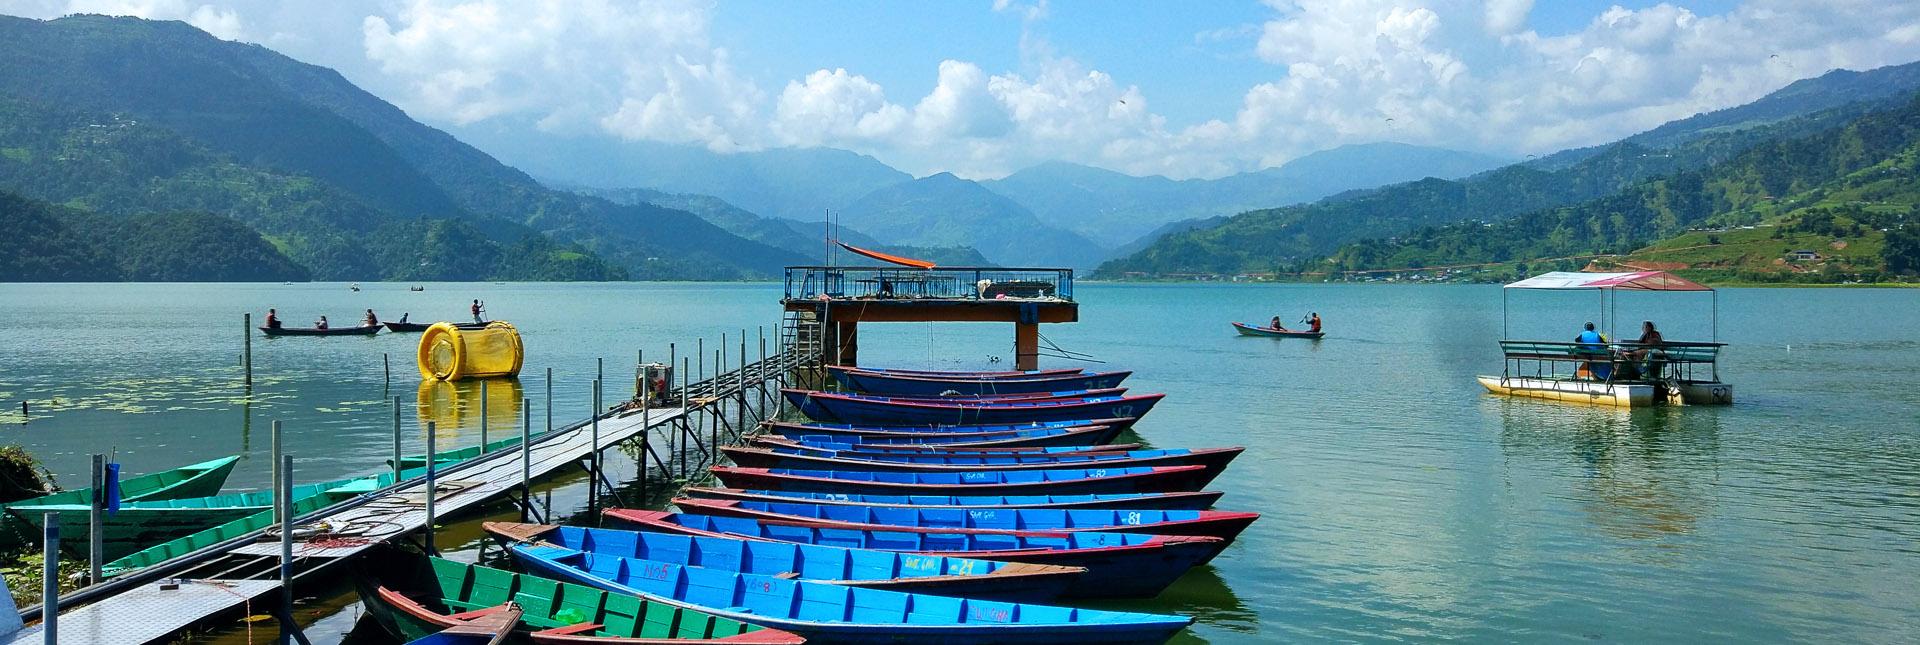 Phewa Tal lake in Pokhara